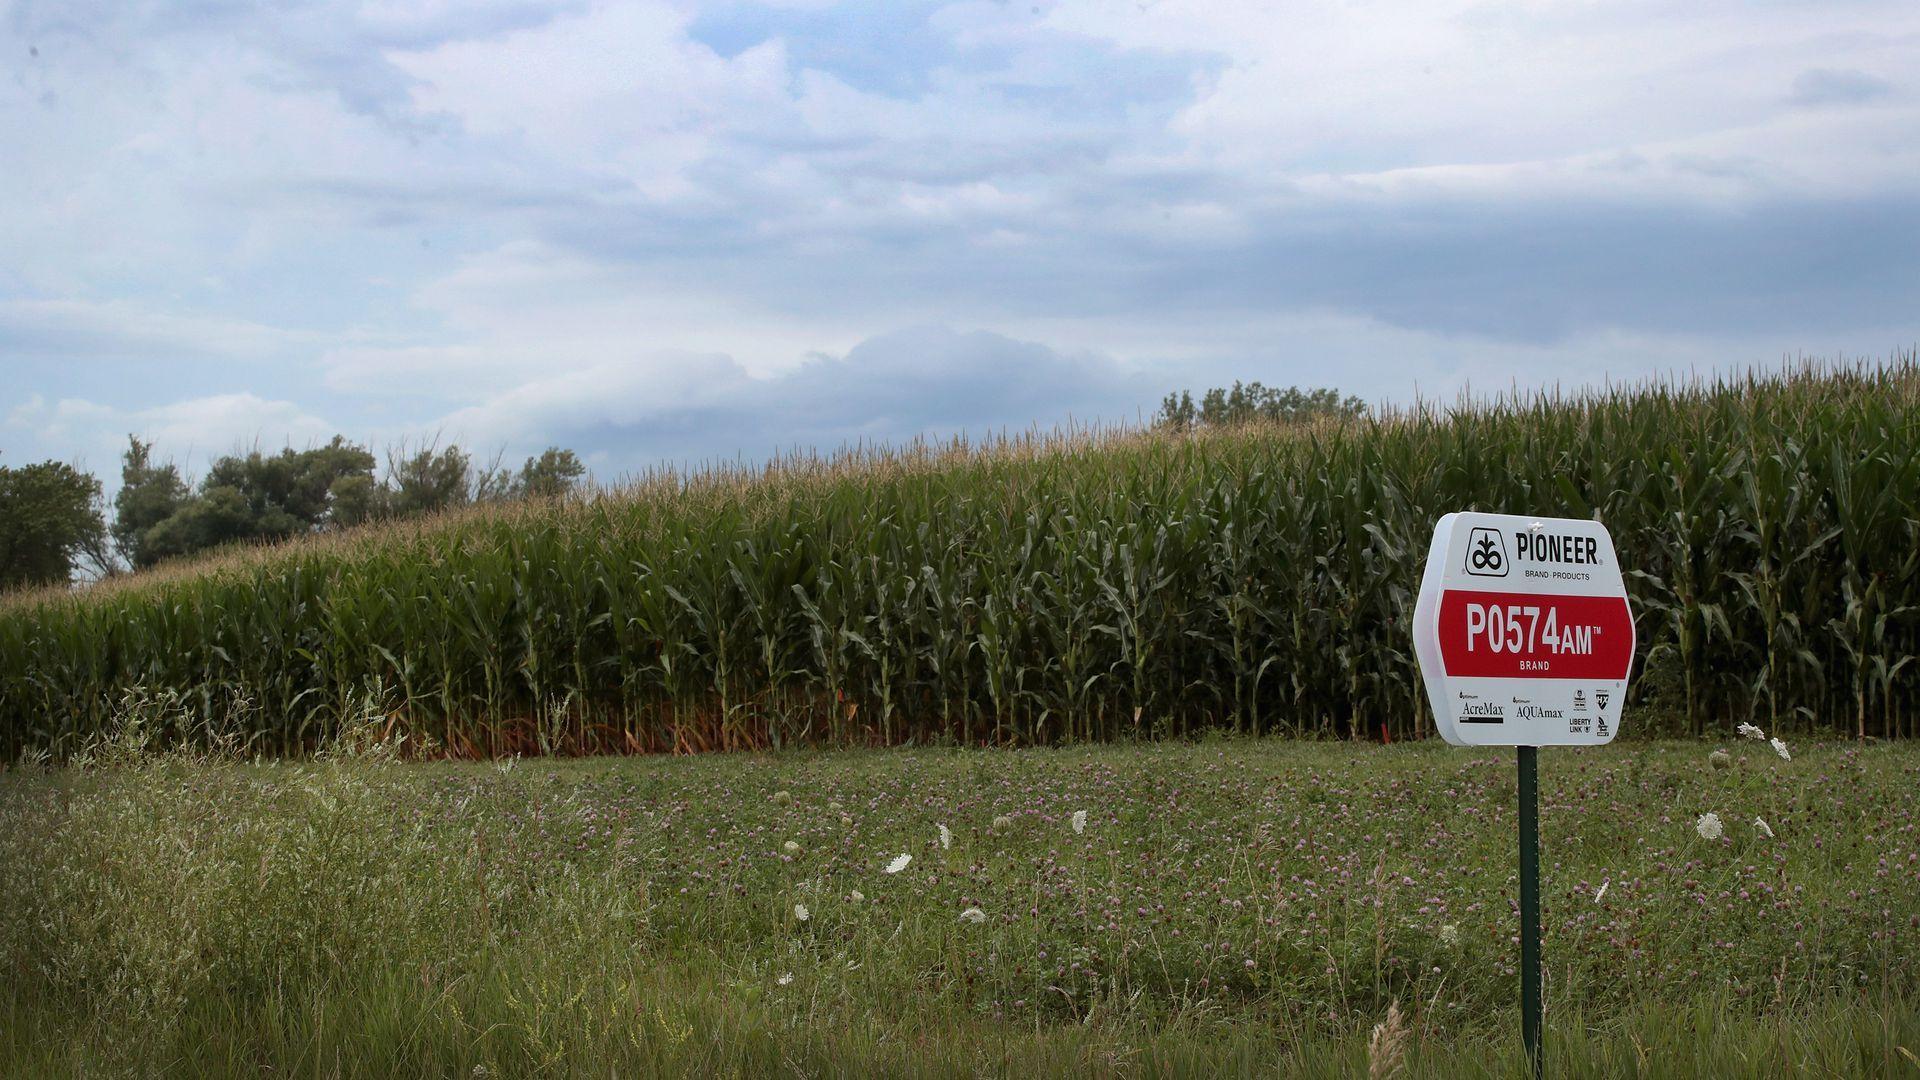 A corn farm in Iowa